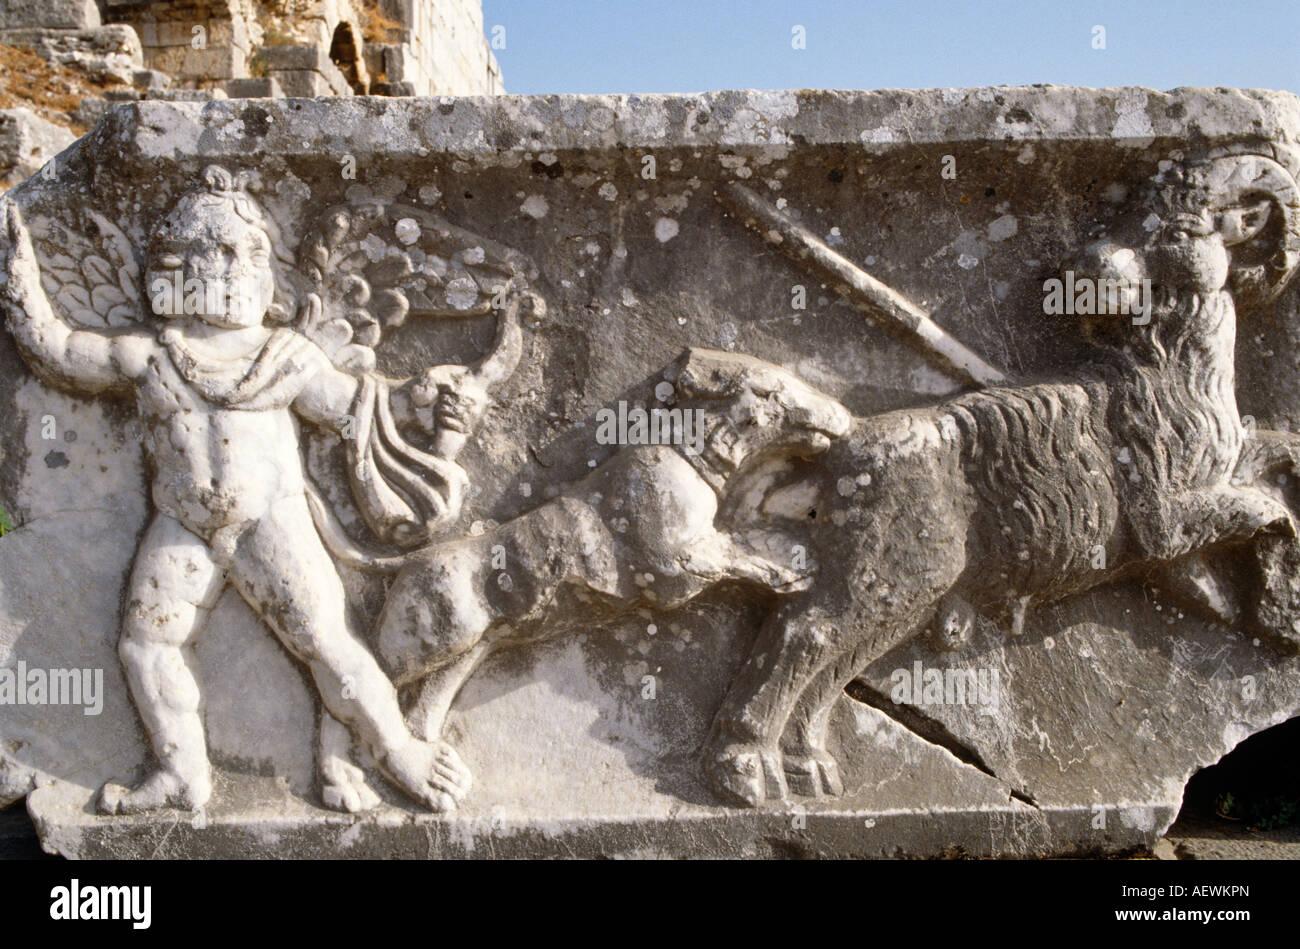 Ancient Sculpture Helenistic  Aphrodisias Ancient Site Turkey - Stock Image